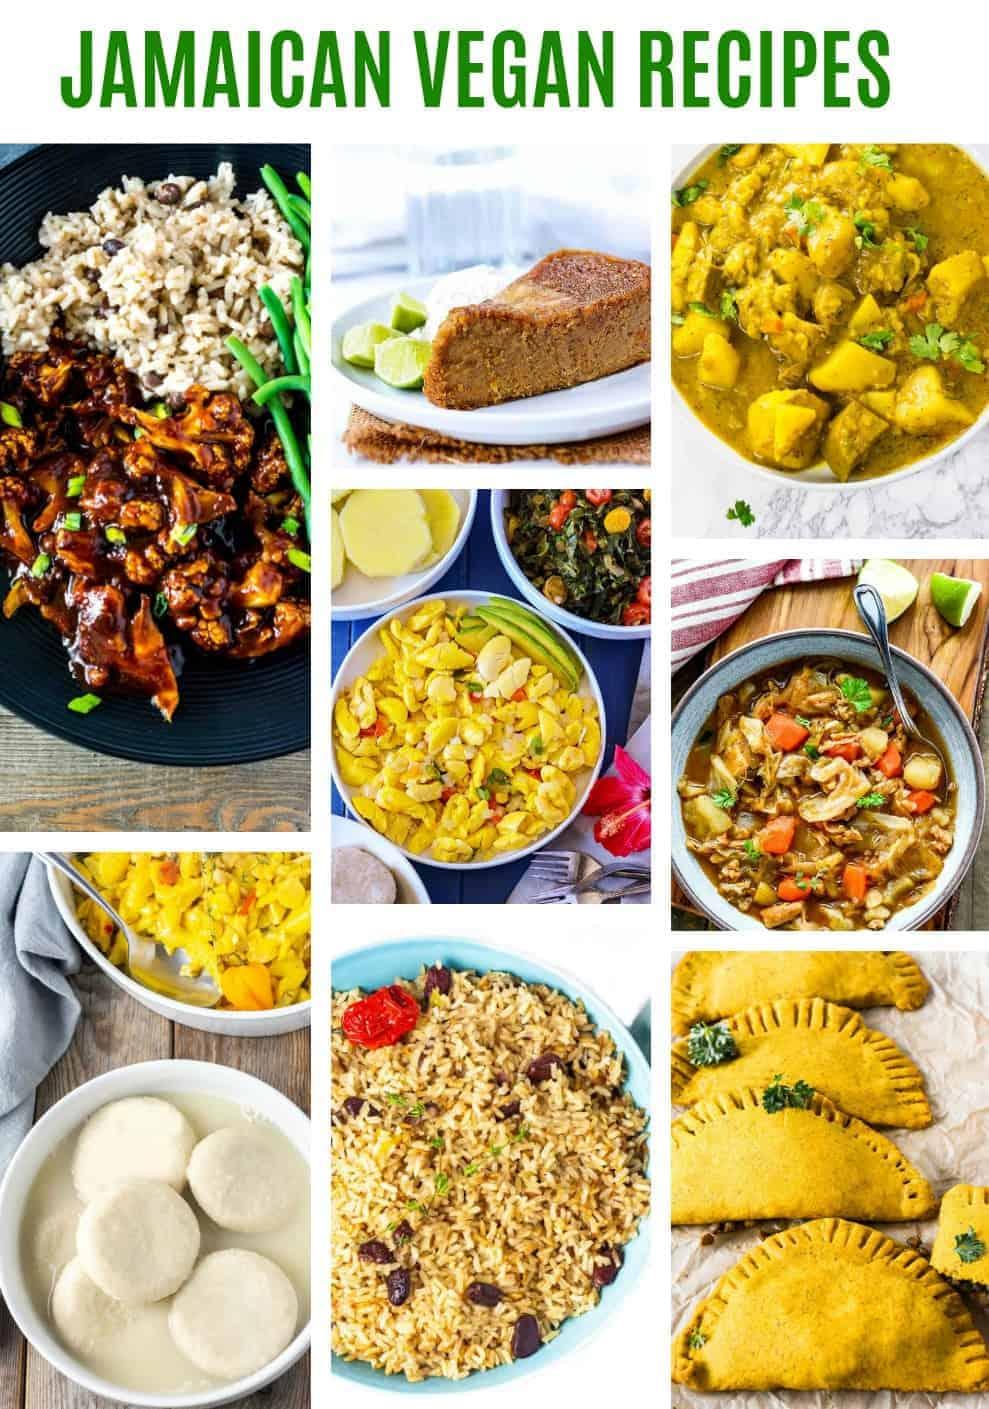 Jamaican Vegan Recipes